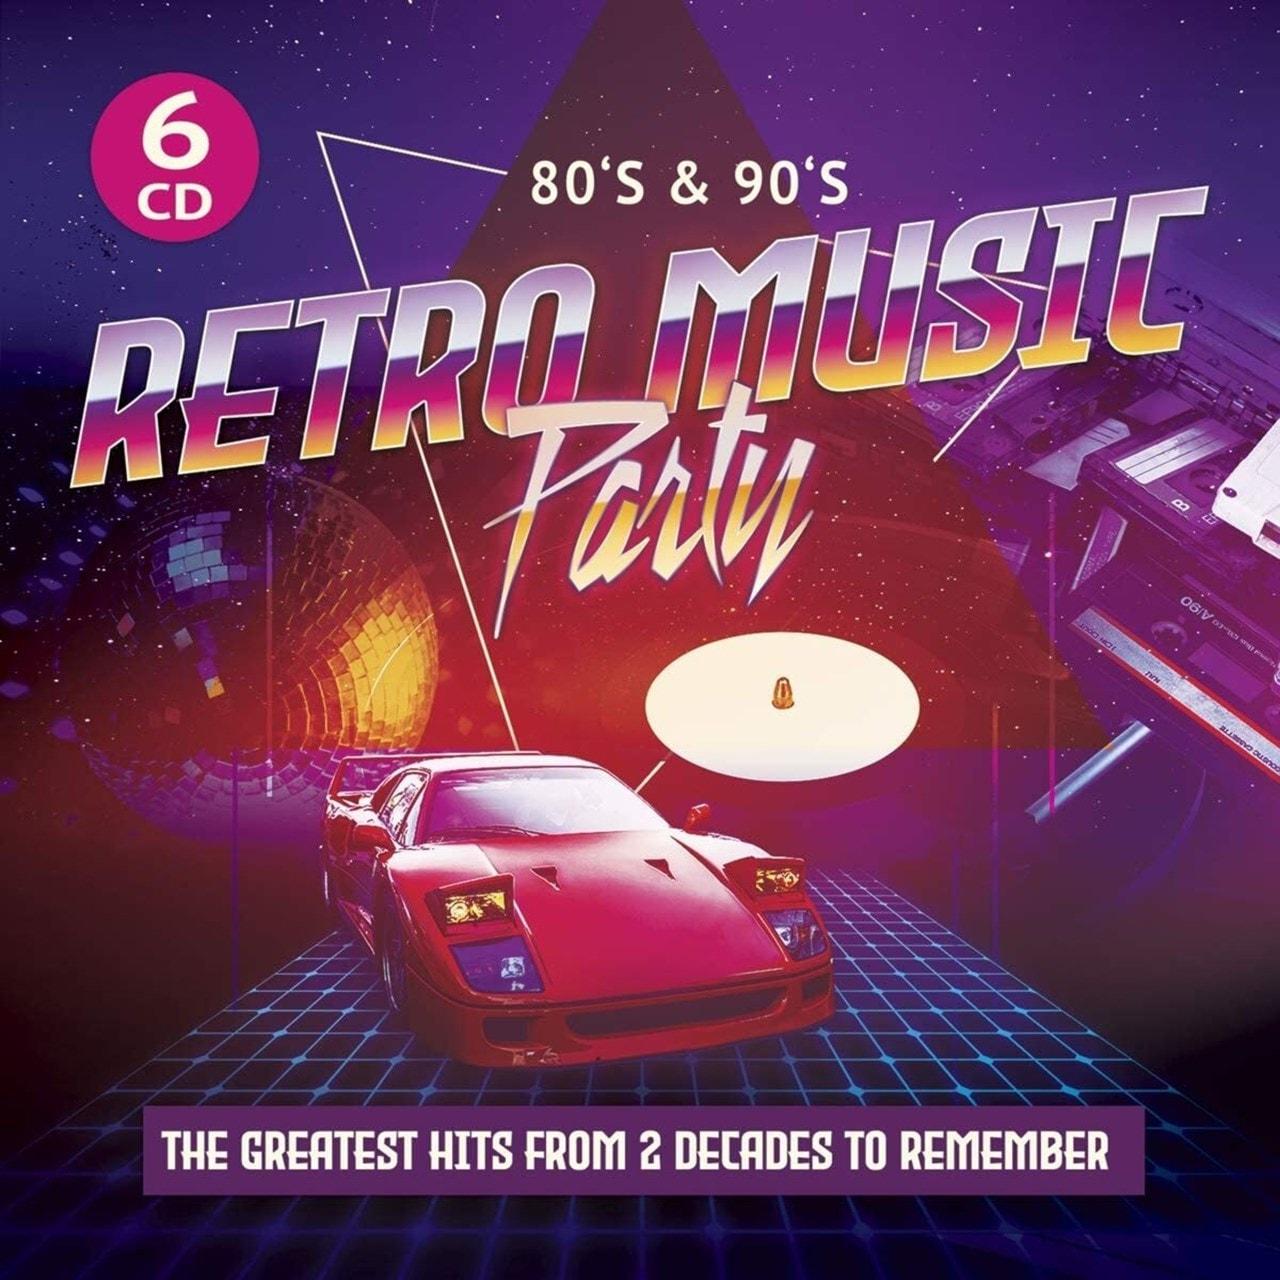 80's & 90's Retro Music Party - 1